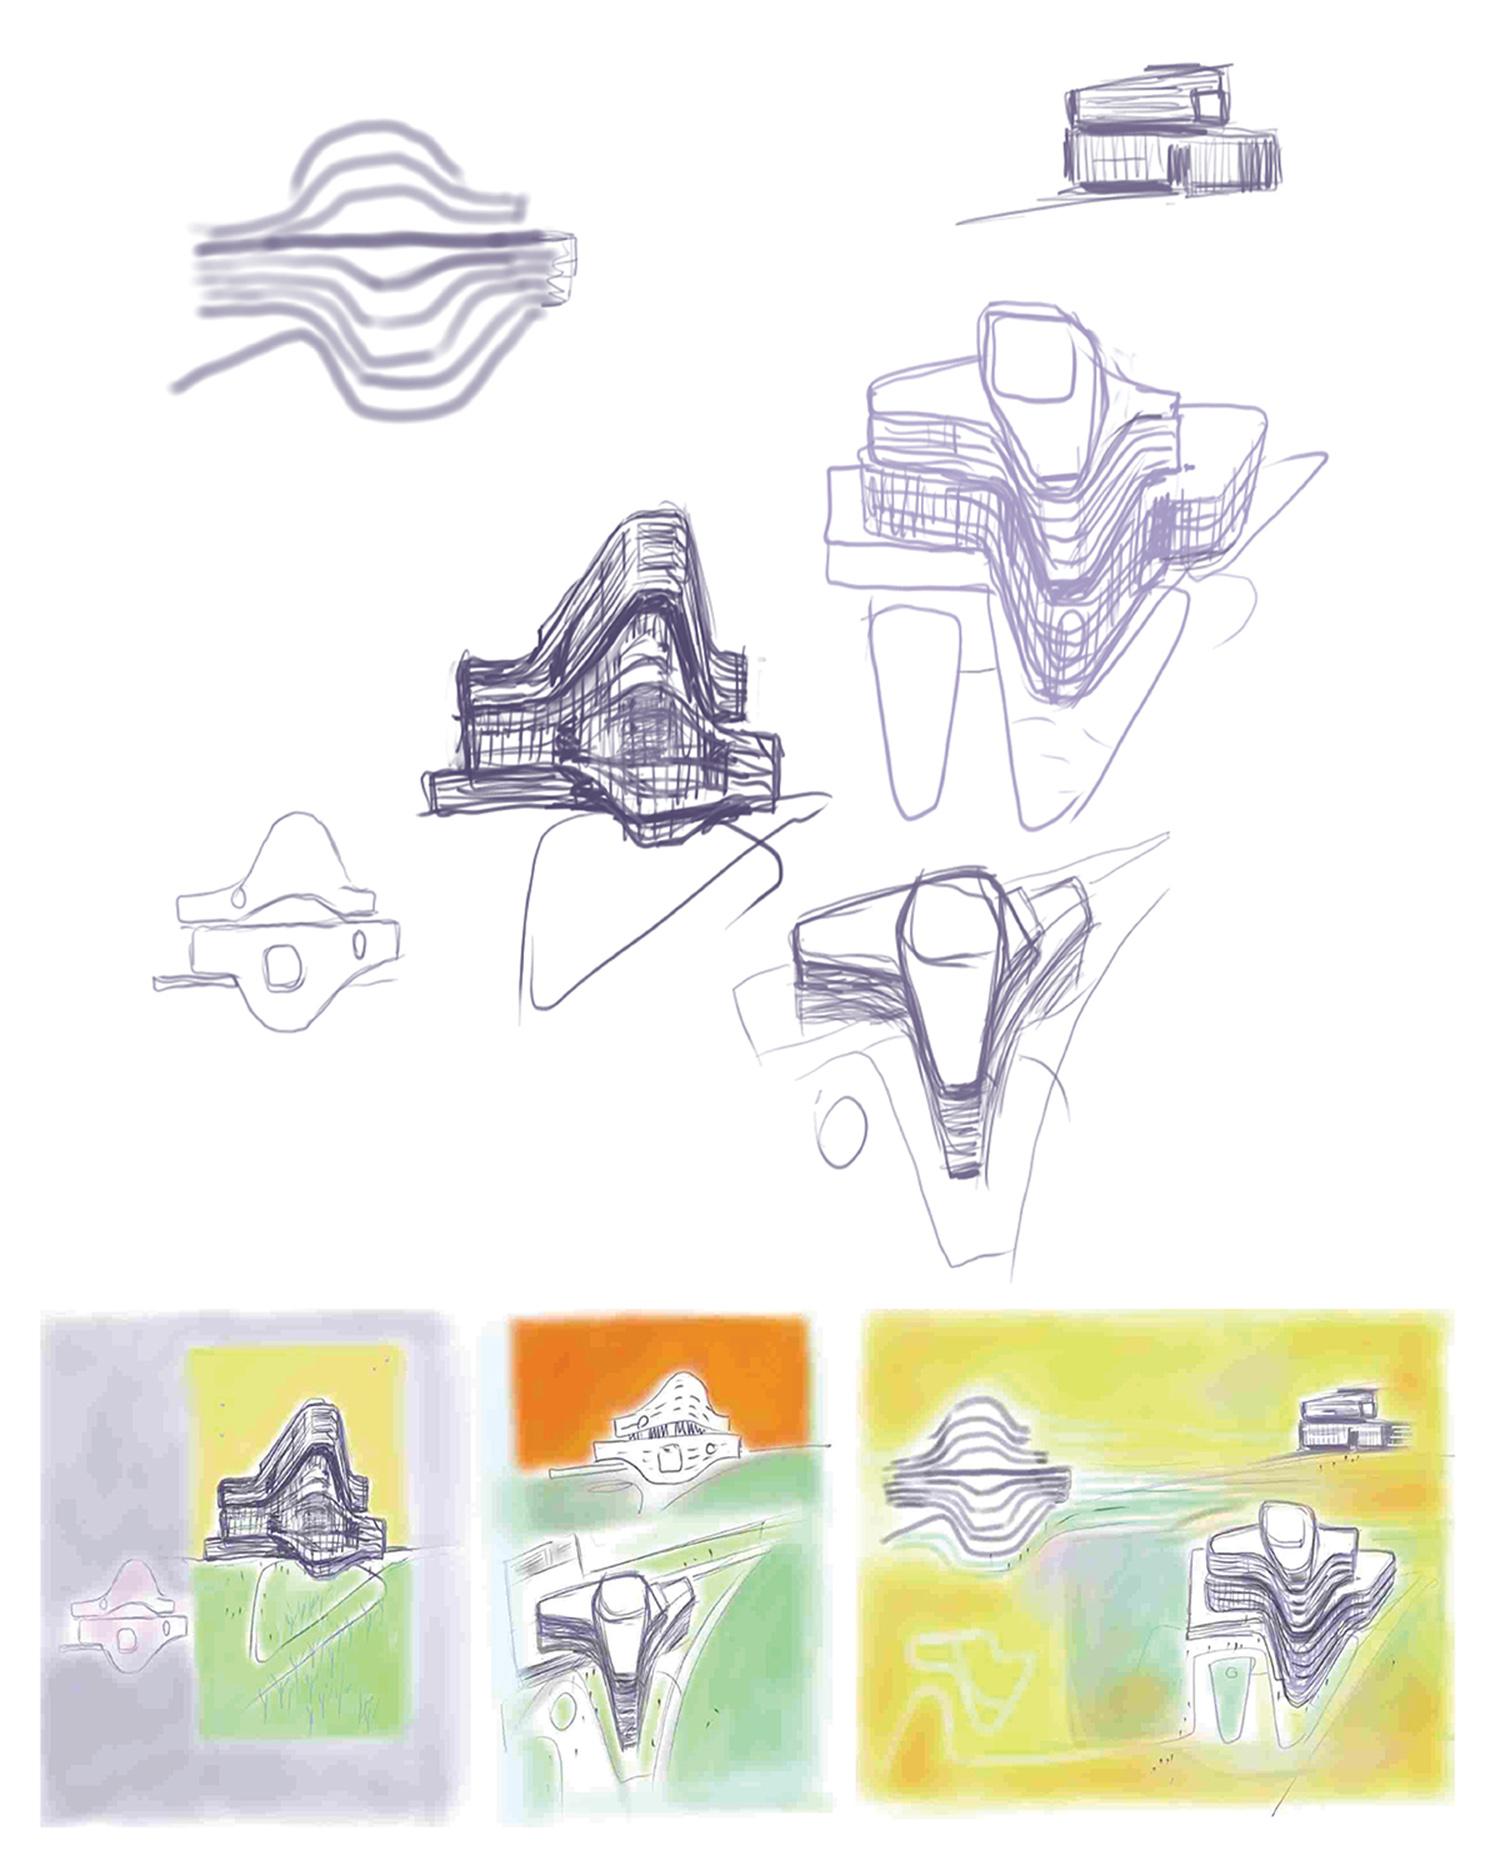 Concept Sketches Yazdani Studio of CannonDesign}